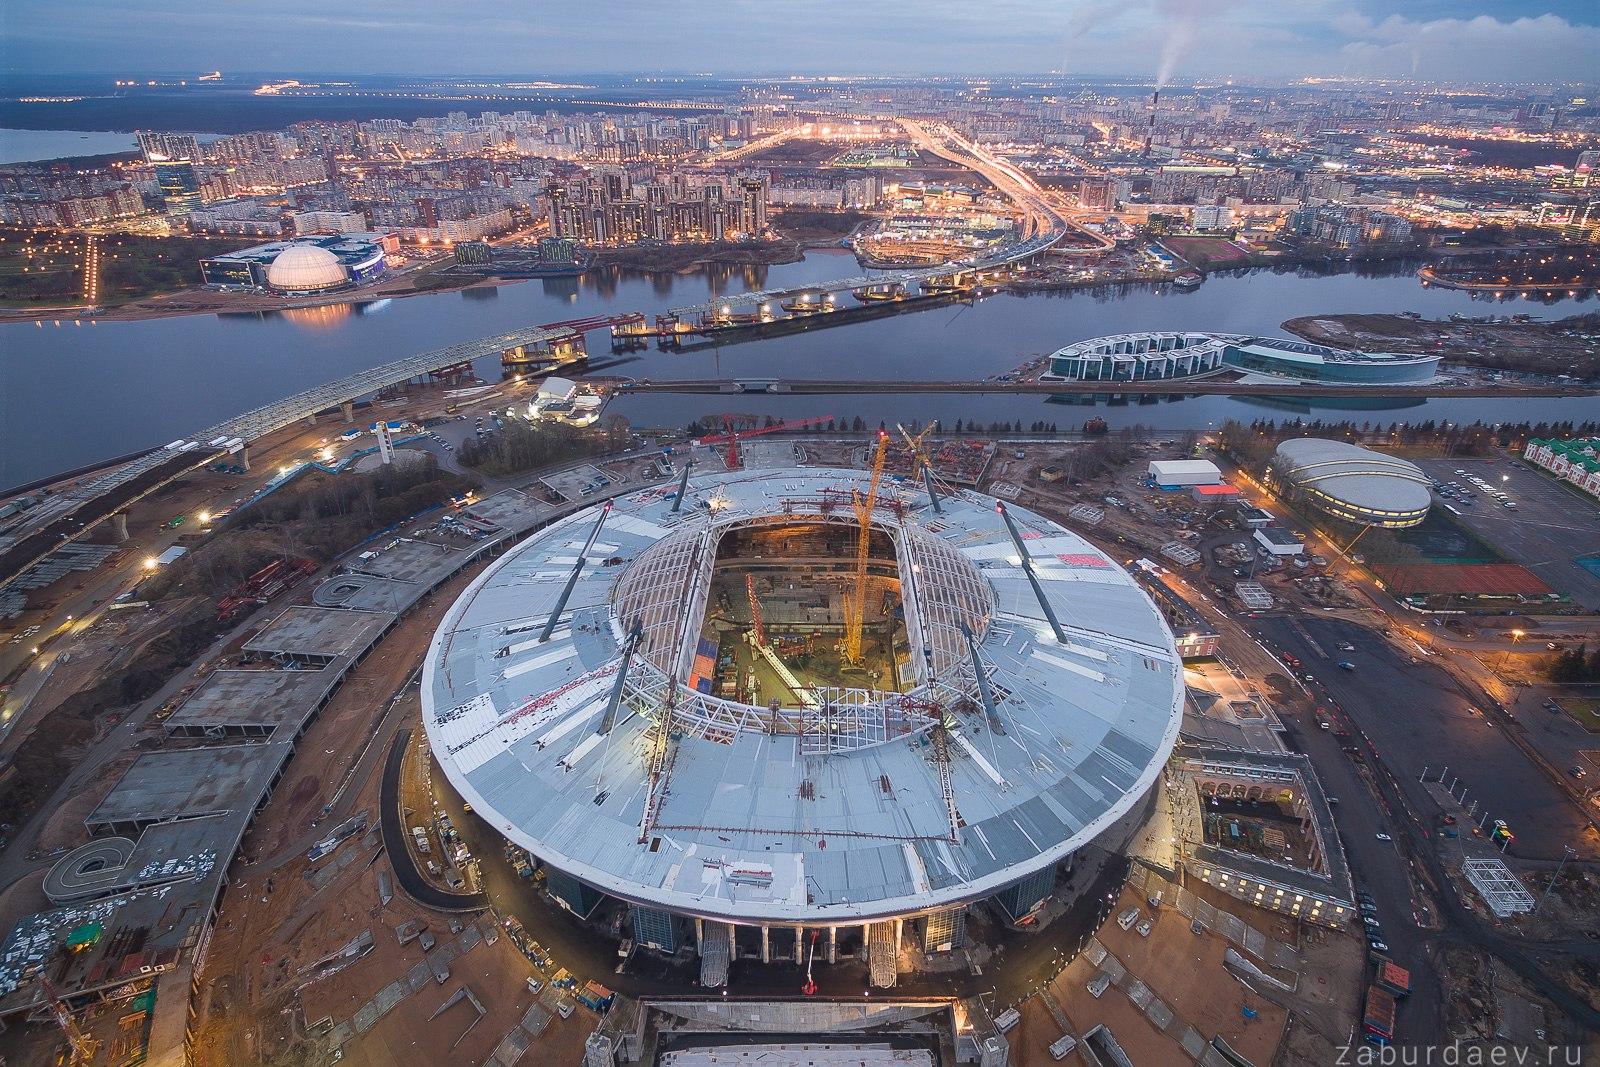 Стадион Зенит (Газпром) Арена